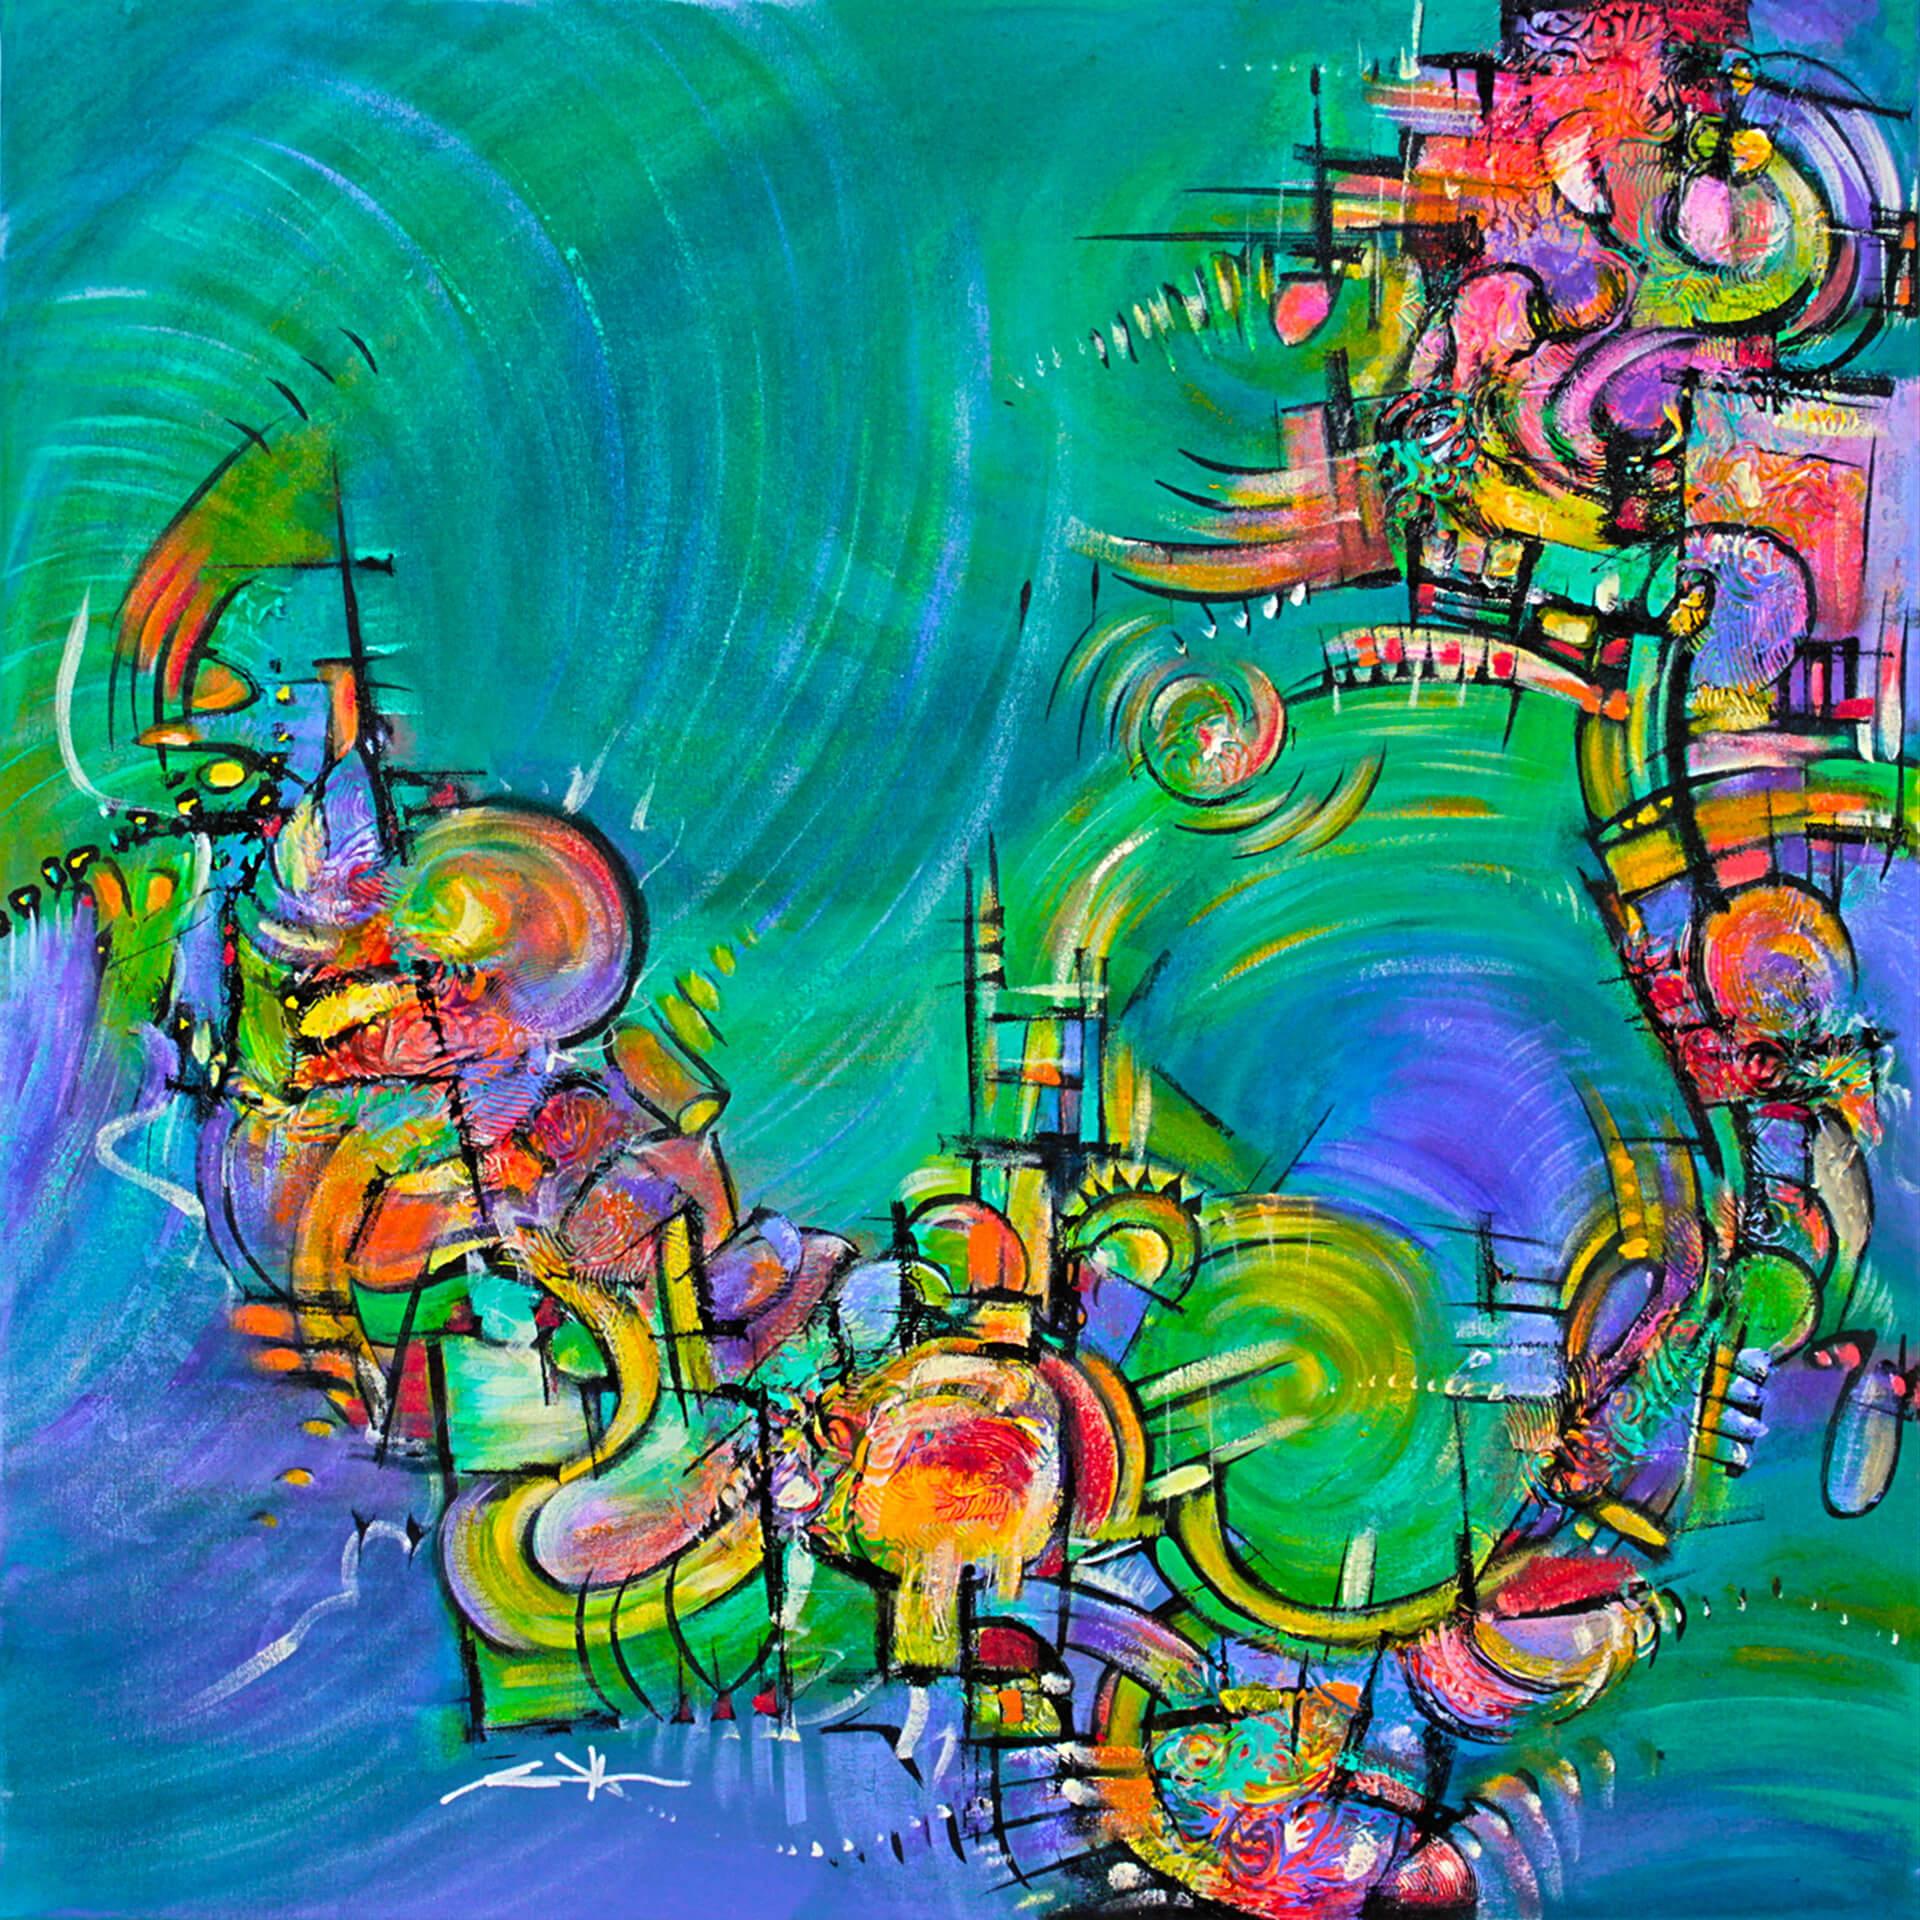 art-eric-j-hughes-artiste-peintre-canadien-tableau-symbiose-kamelemeraude-a